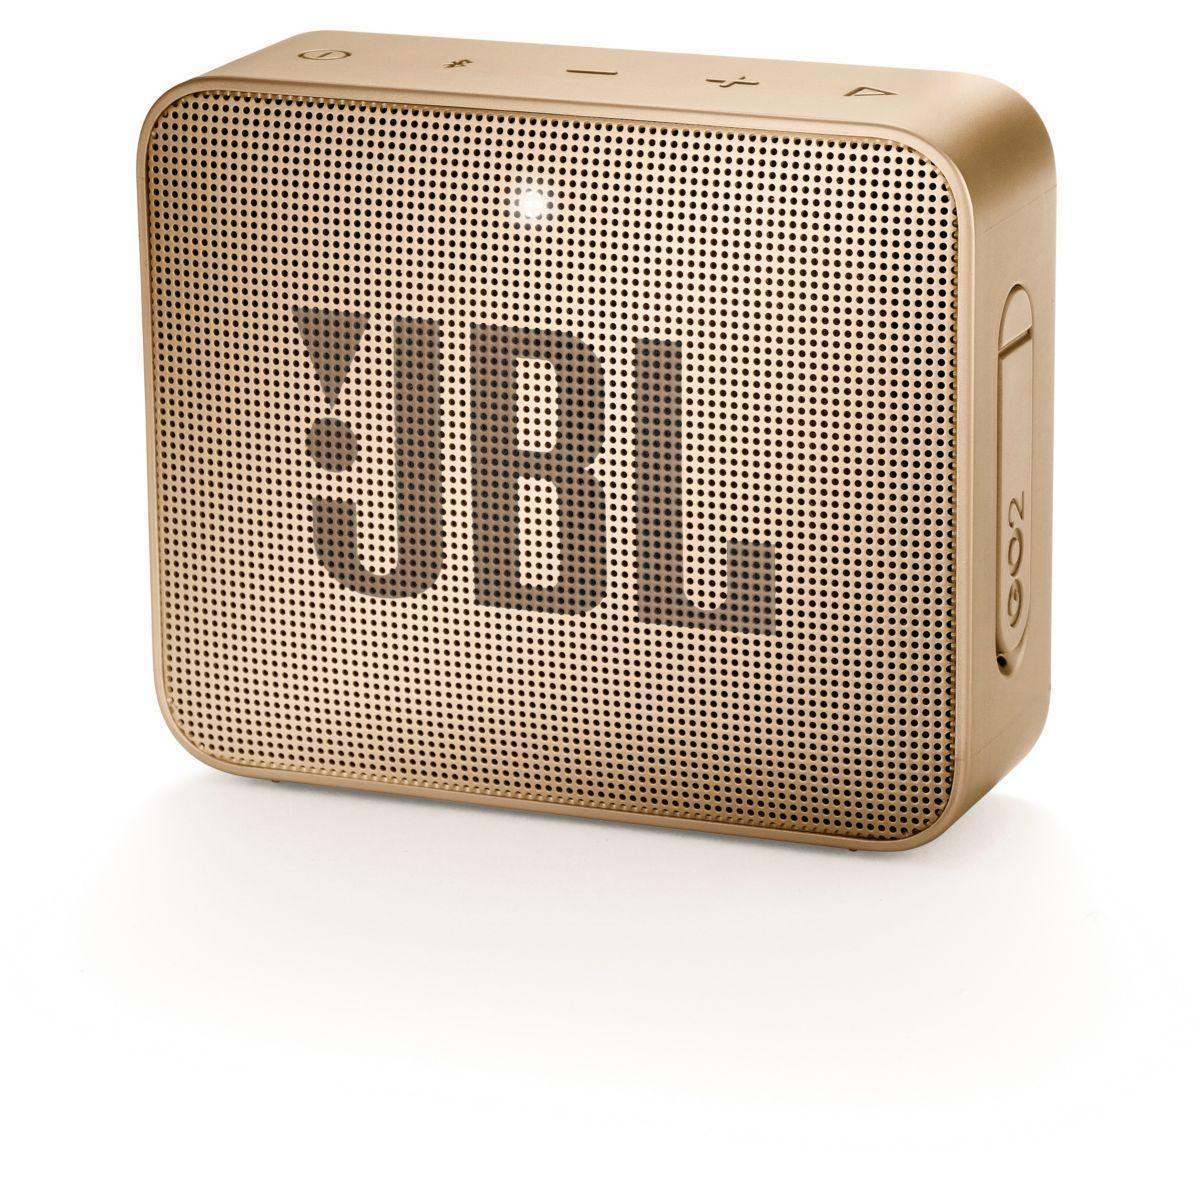 Enceinte bluetooth jbl go 2 champagne - livraison offerte : code livdom (photo)